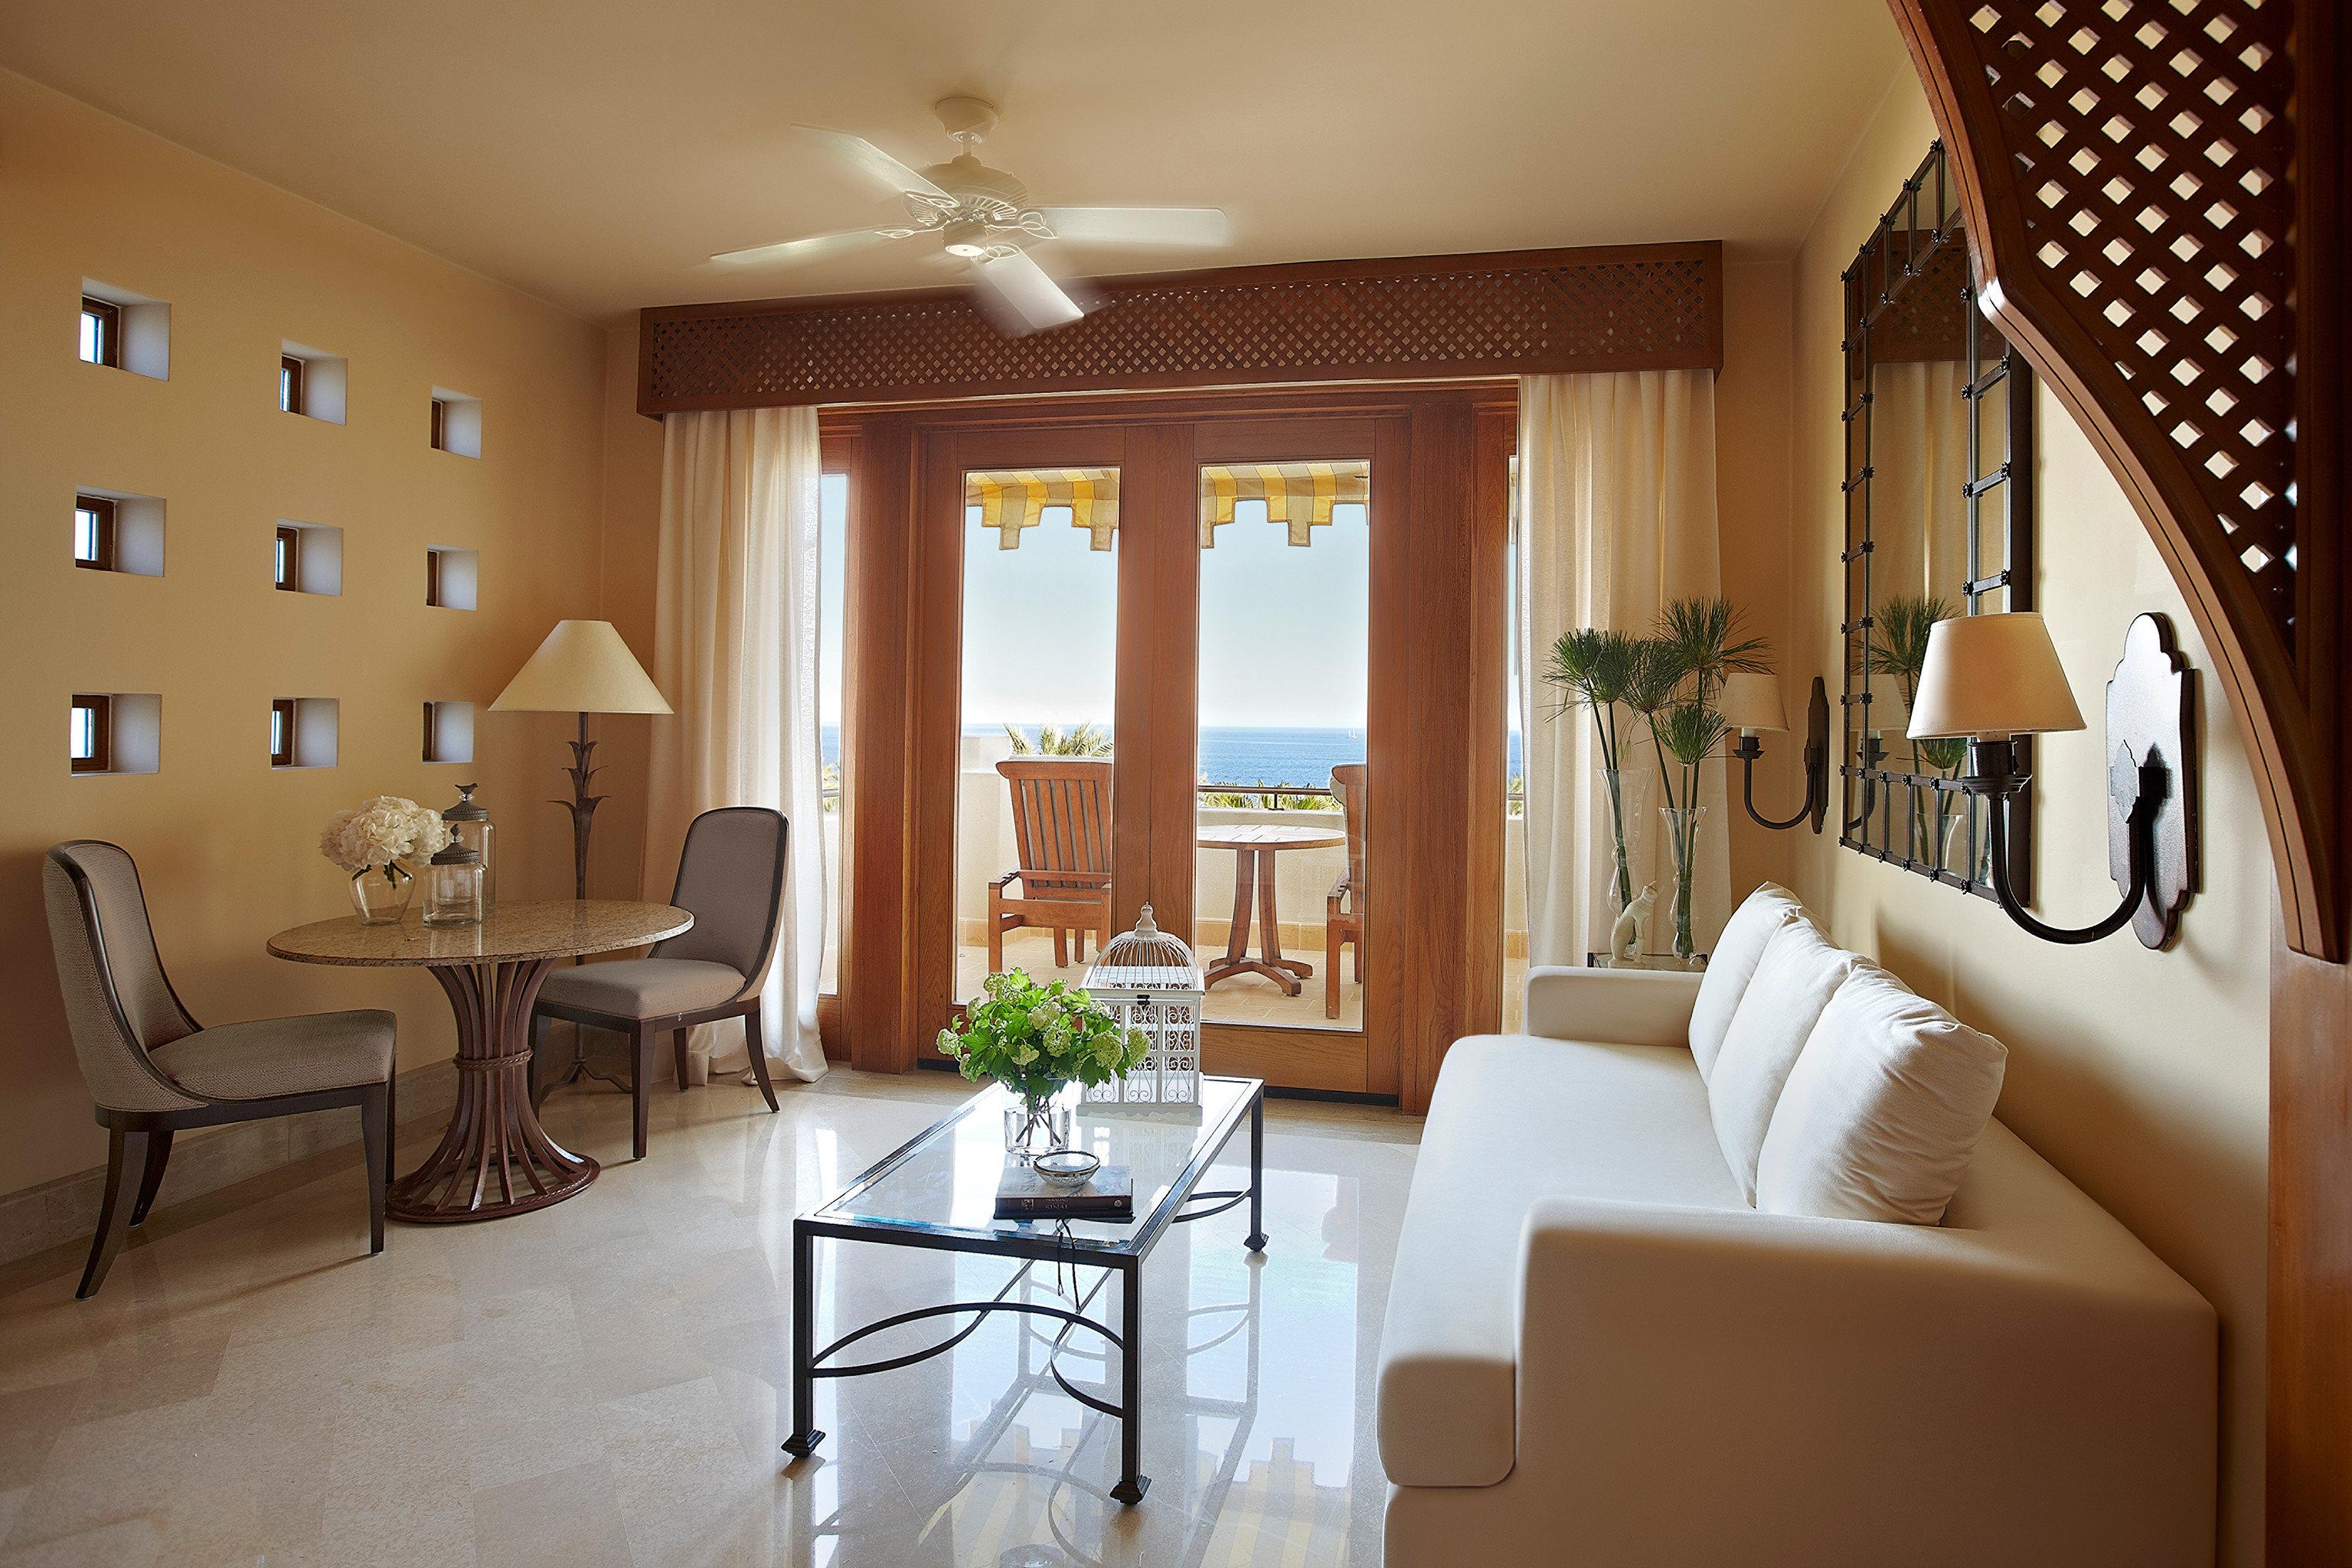 Bedroom Classic Elegant Scenic views Suite property living room home condominium hardwood cottage Villa